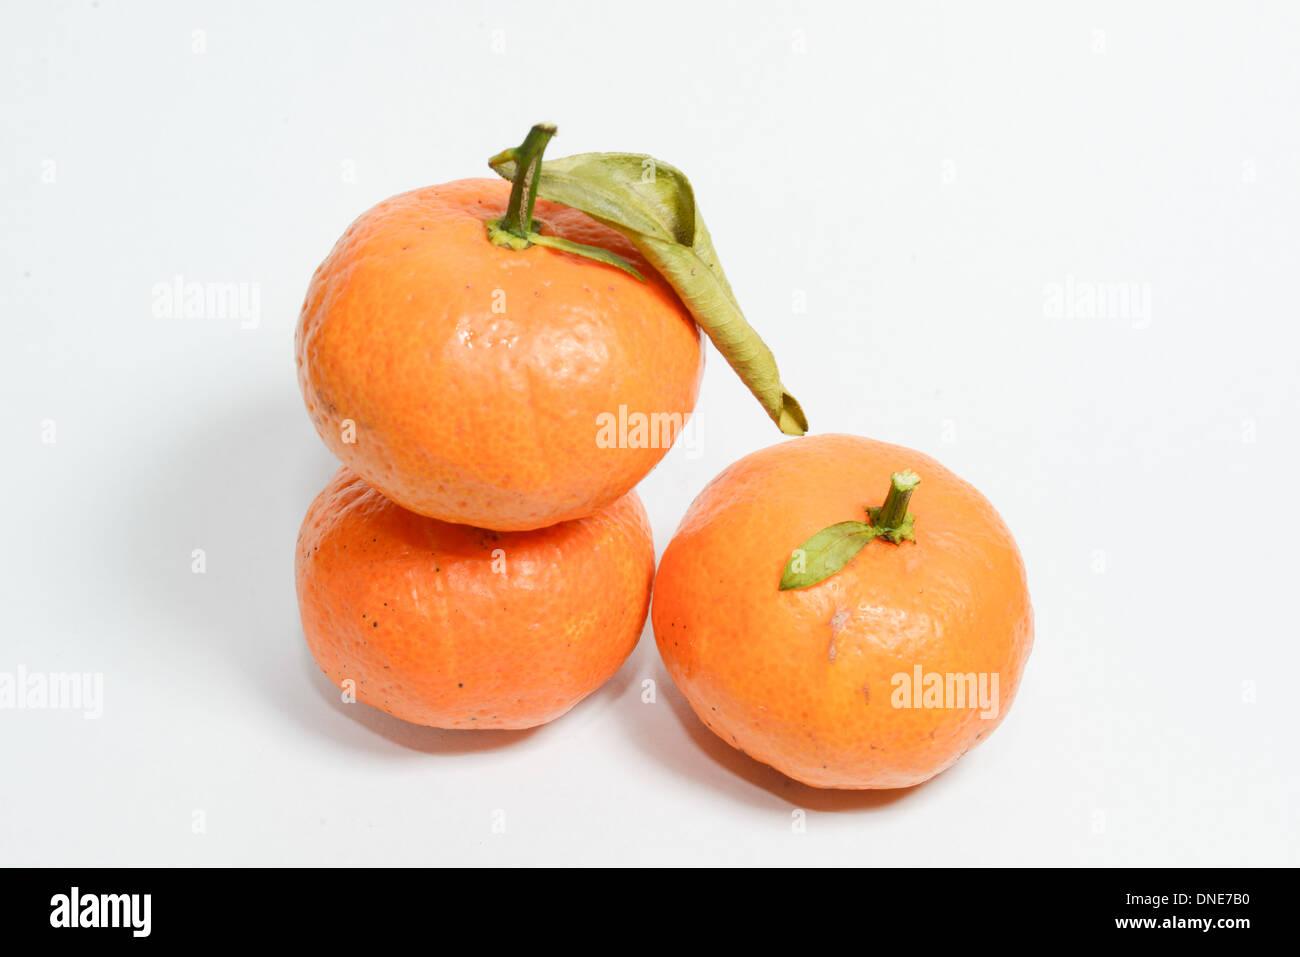 Oranges - Stock Image